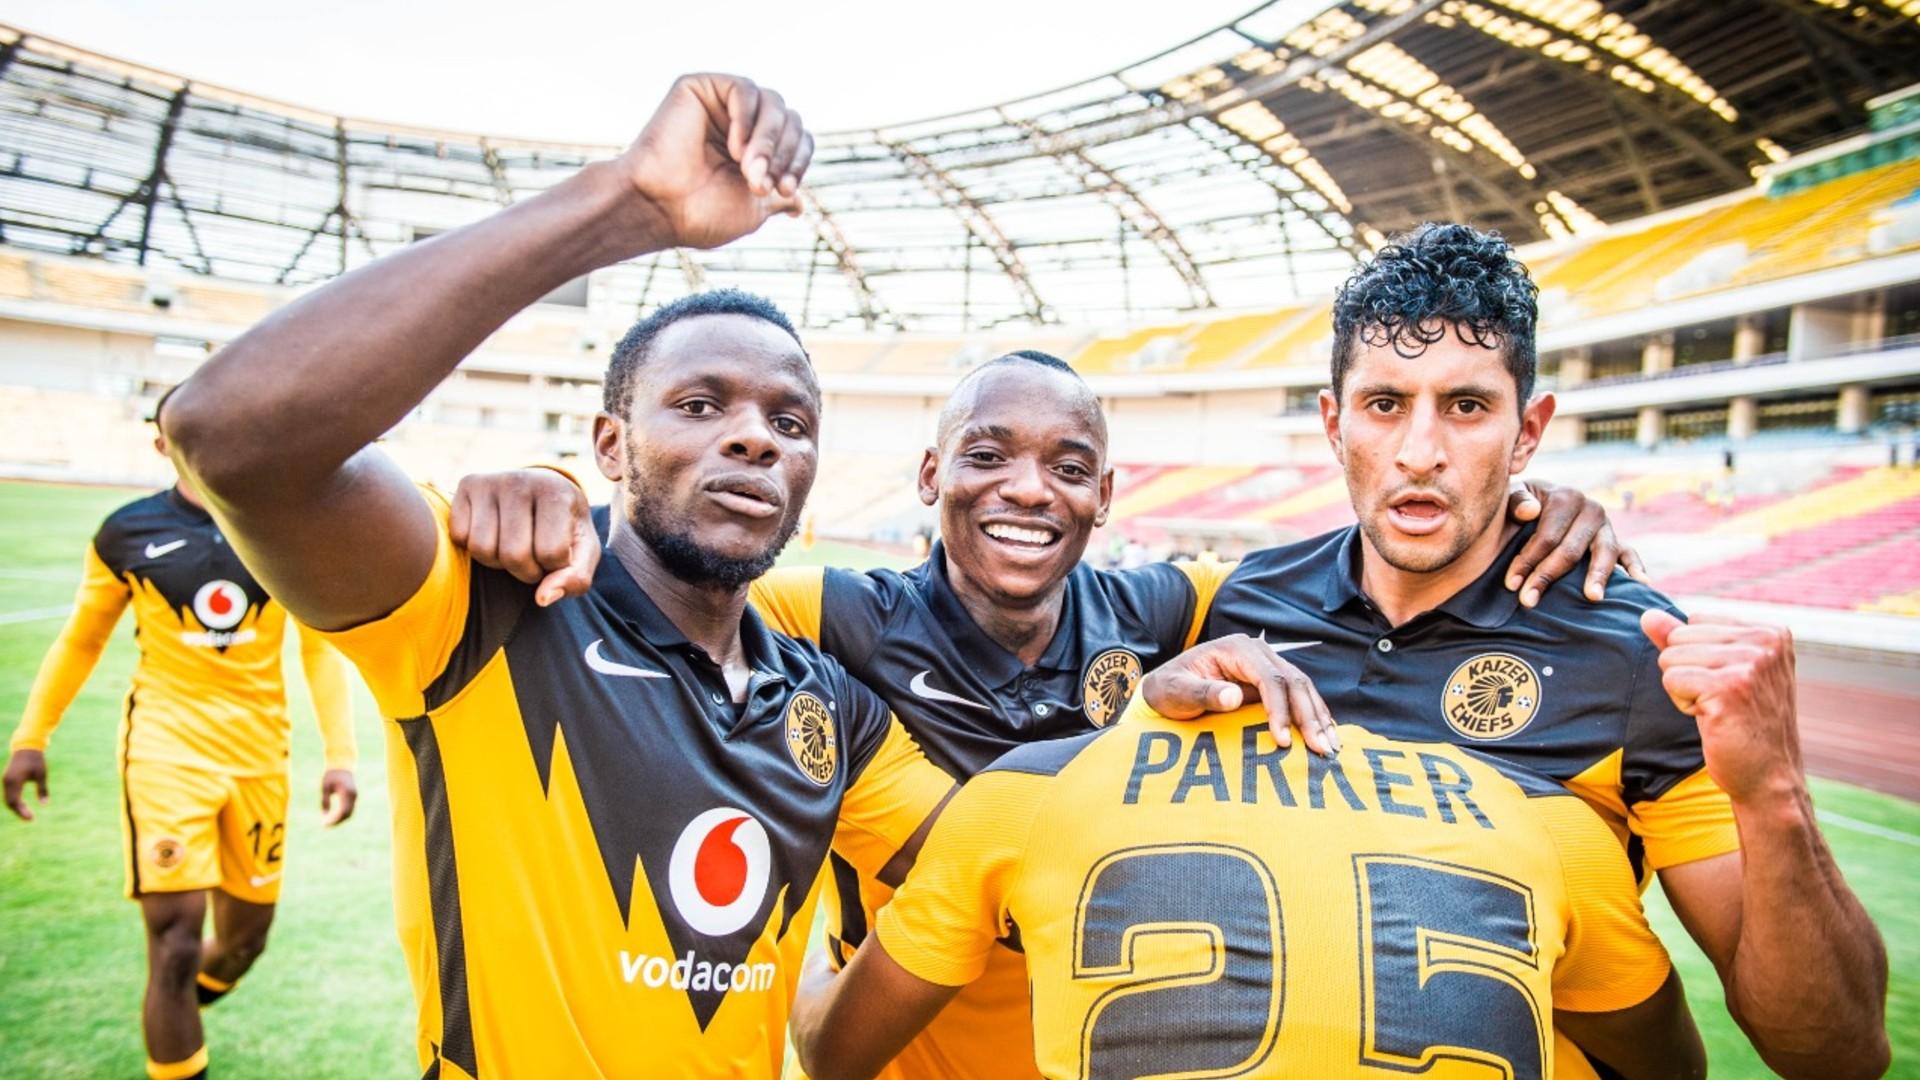 Kaizer Chiefs' Castro, Billiat & Dolly wont replicate Mamelodi Sundowns form - Mphela